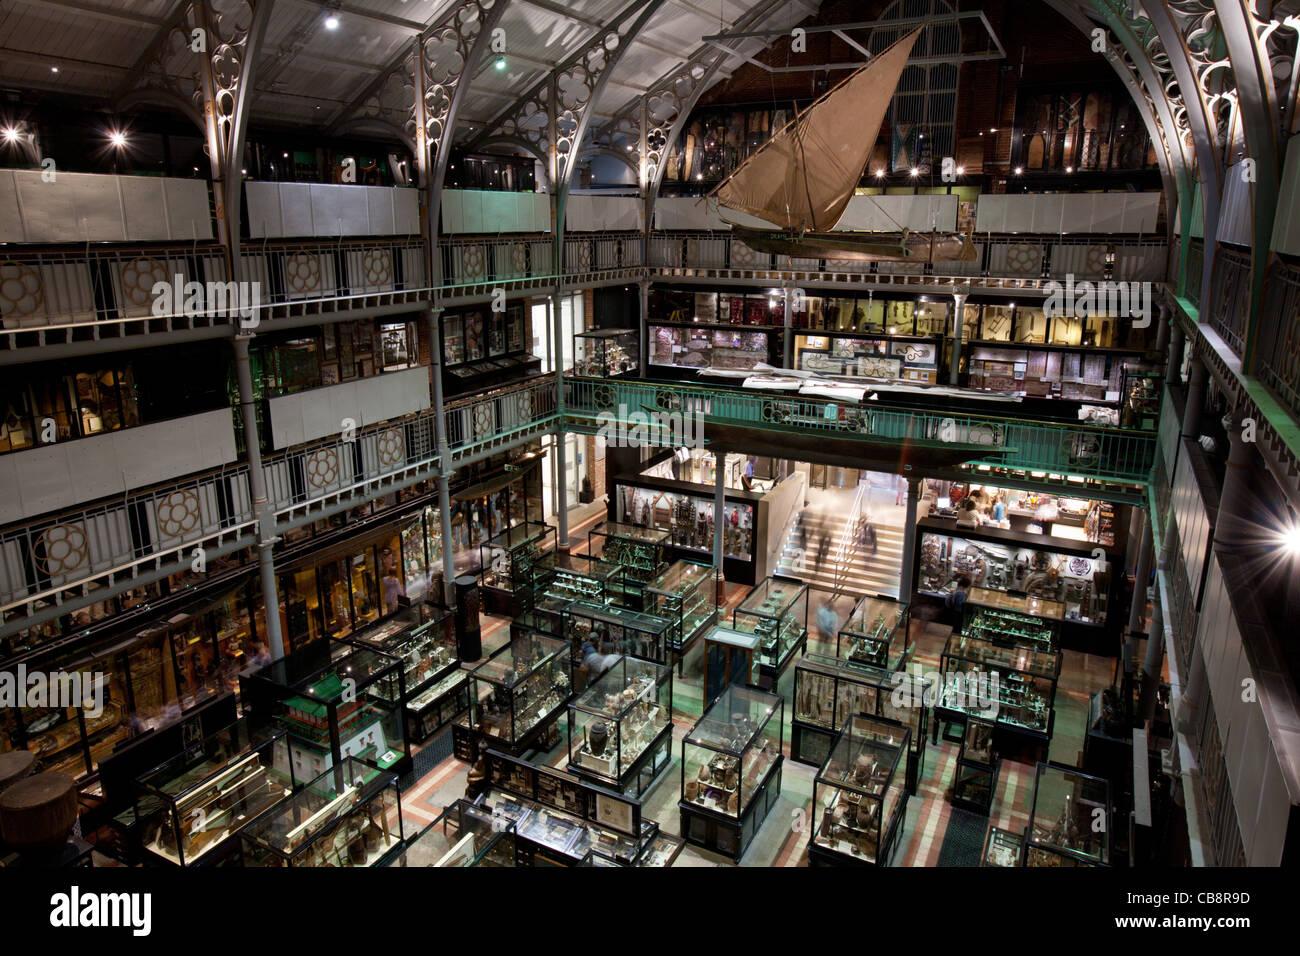 Pitt Rivers Museum, Oxford, UK - Stock Image